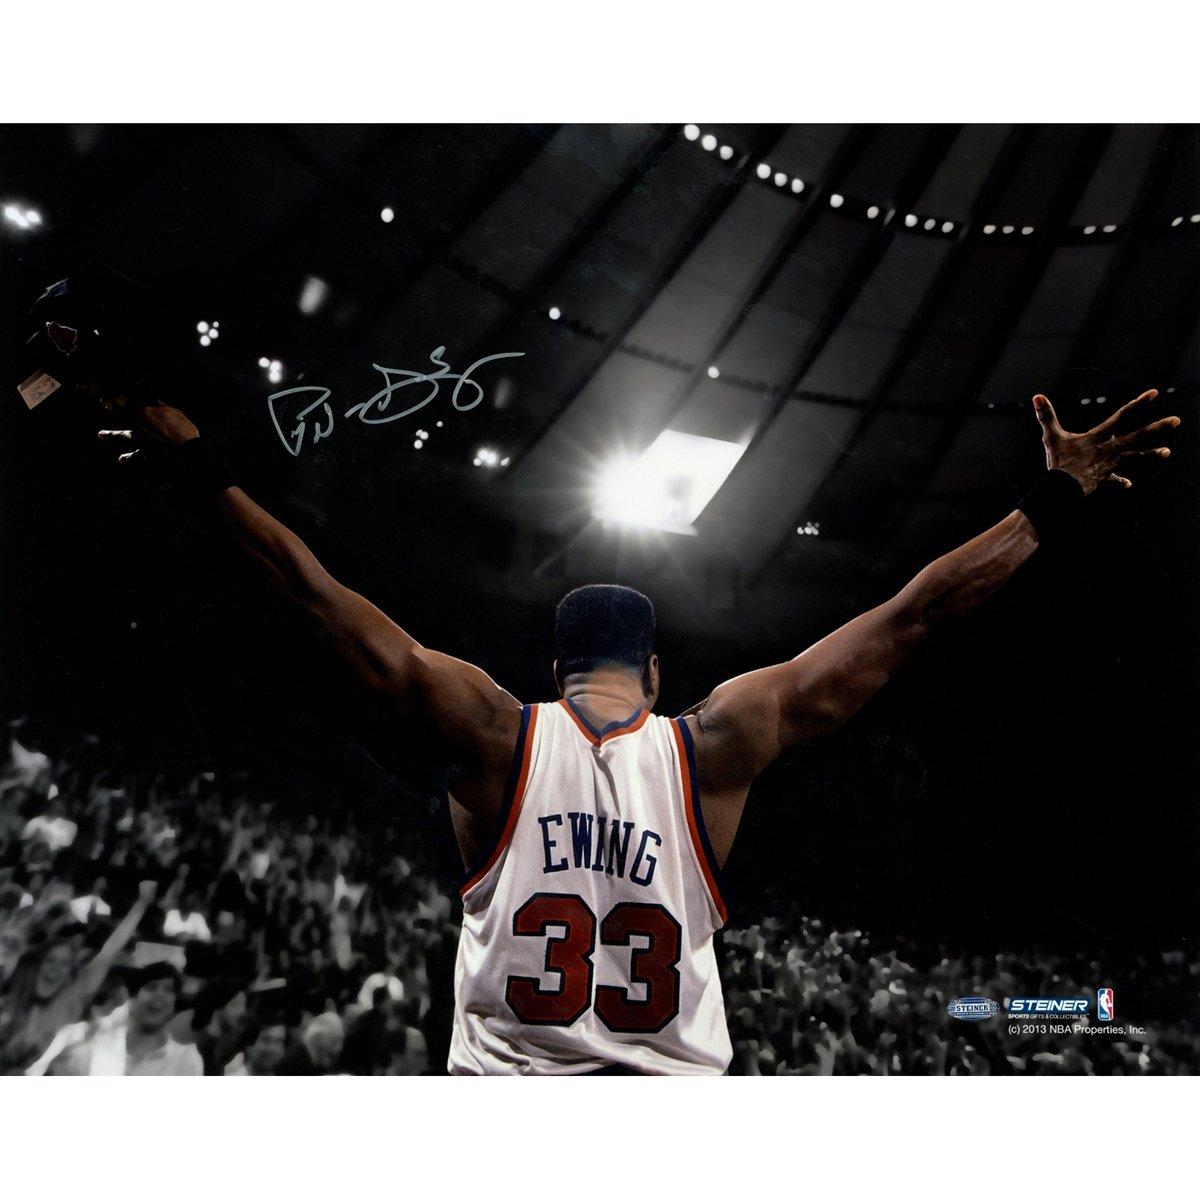 NBA New York Knicks Patrick Ewing Signed Arms Out Facing Crowd Photograph, 16'' x 20''